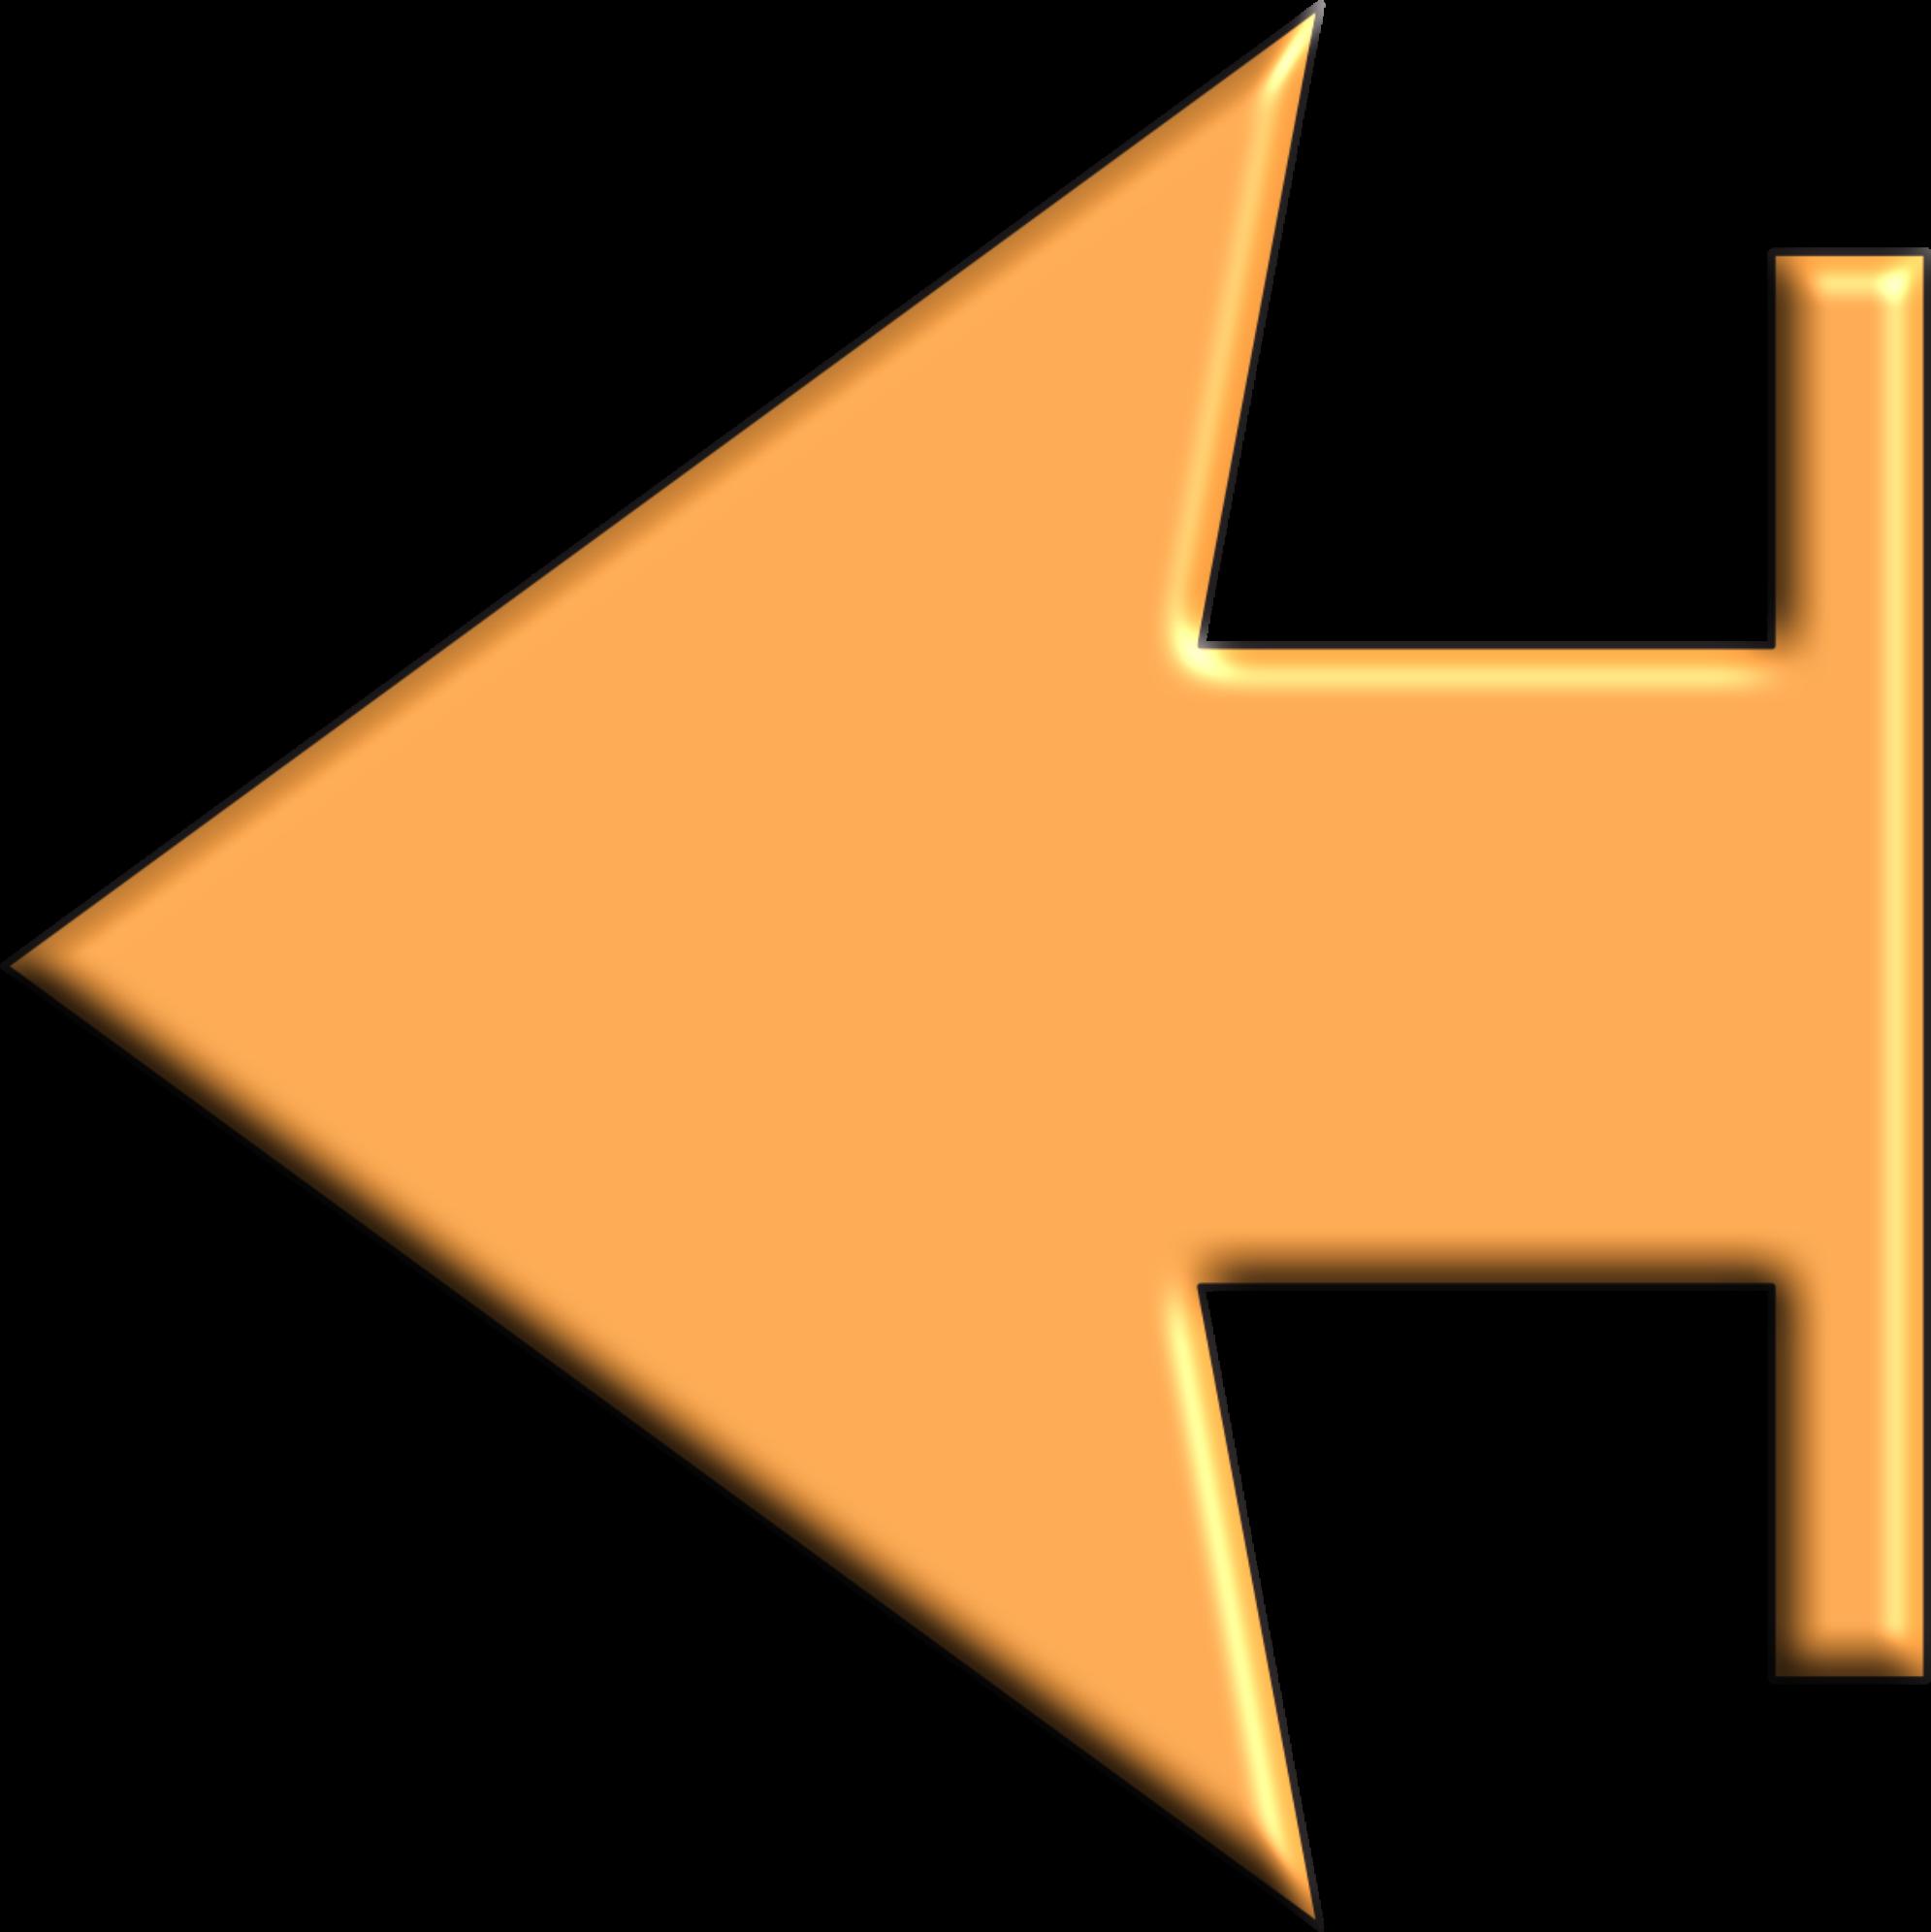 Clipart arrow orange. Left big image png